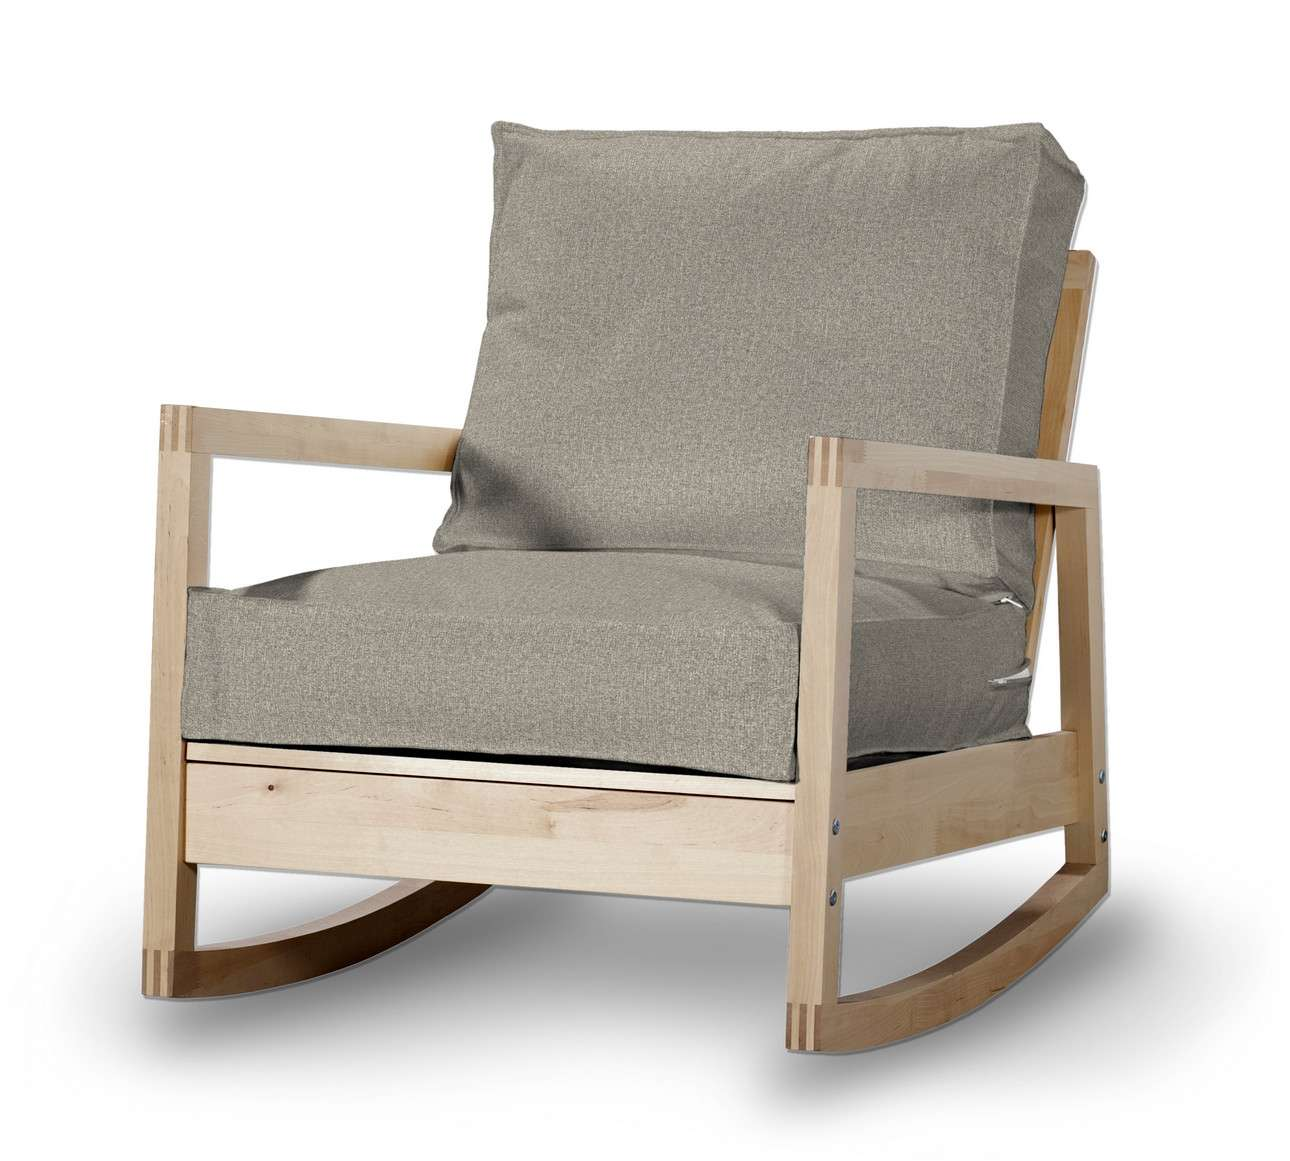 Pokrowiec na fotel Lillberg w kolekcji Madrid, tkanina: 161-23